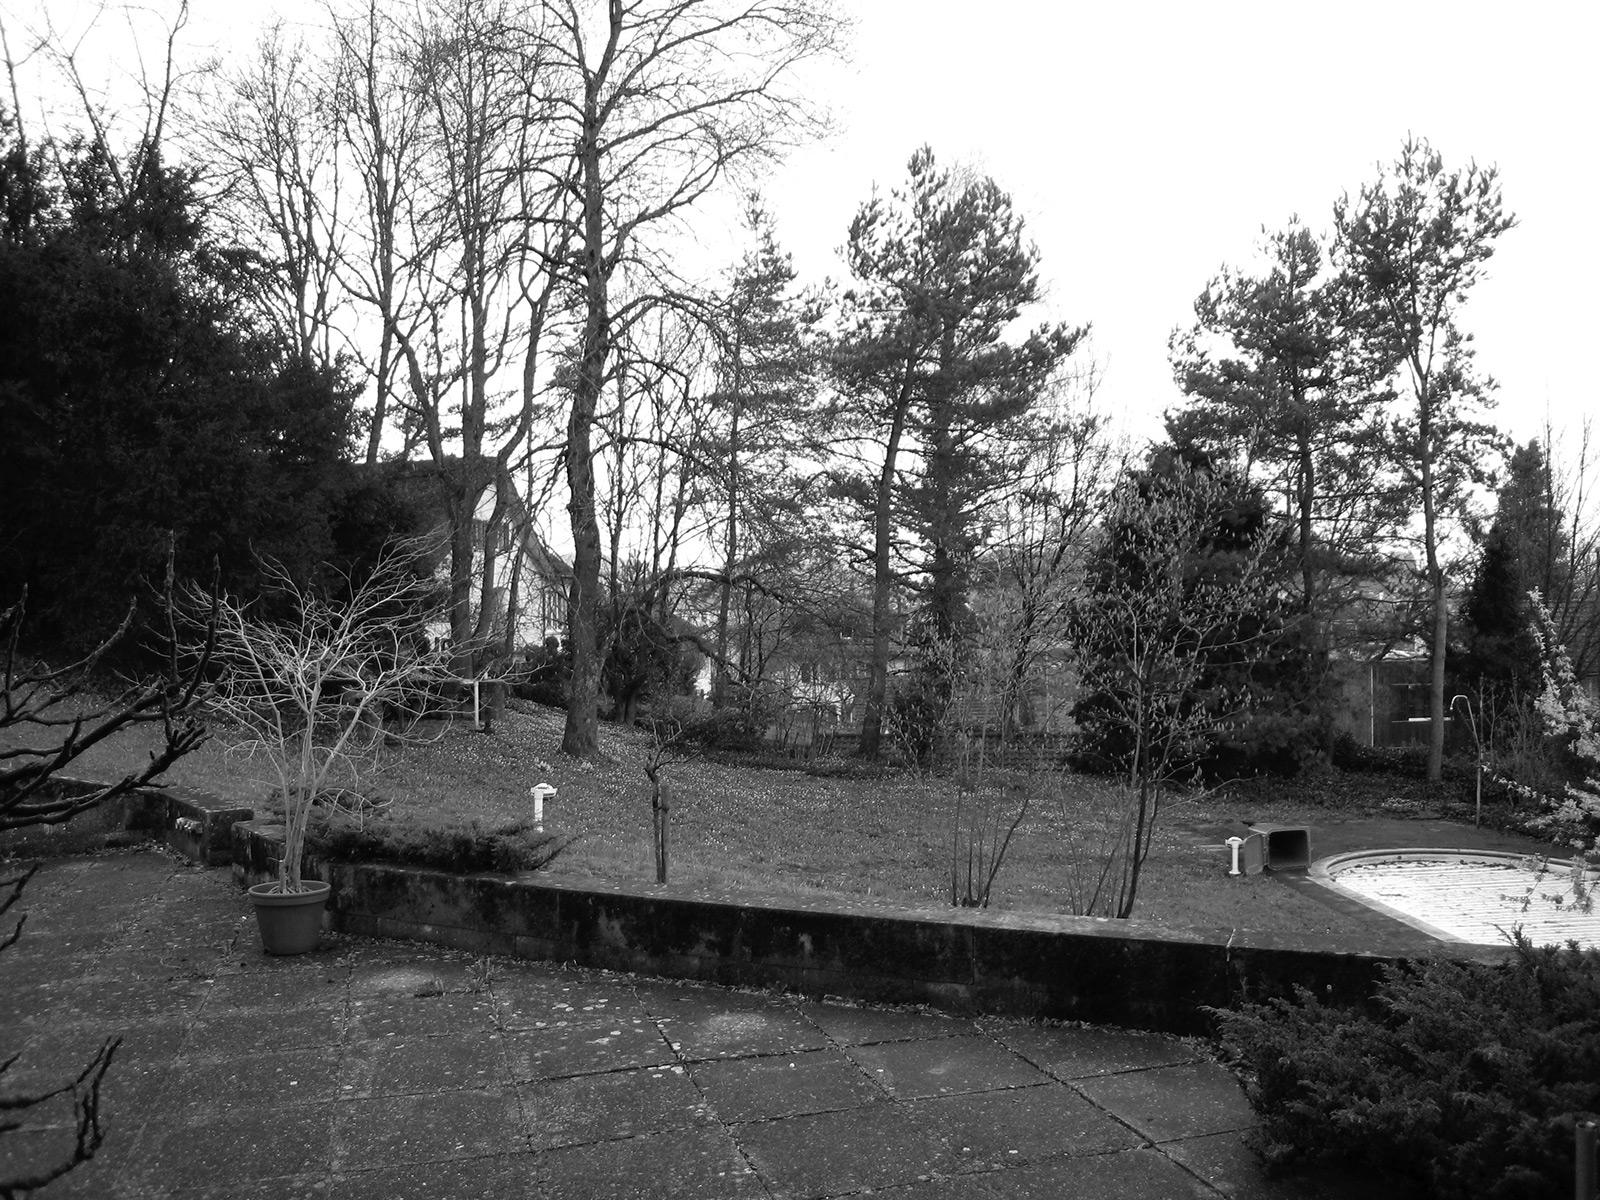 living with a castle view, Brunnmattstrassse, plot